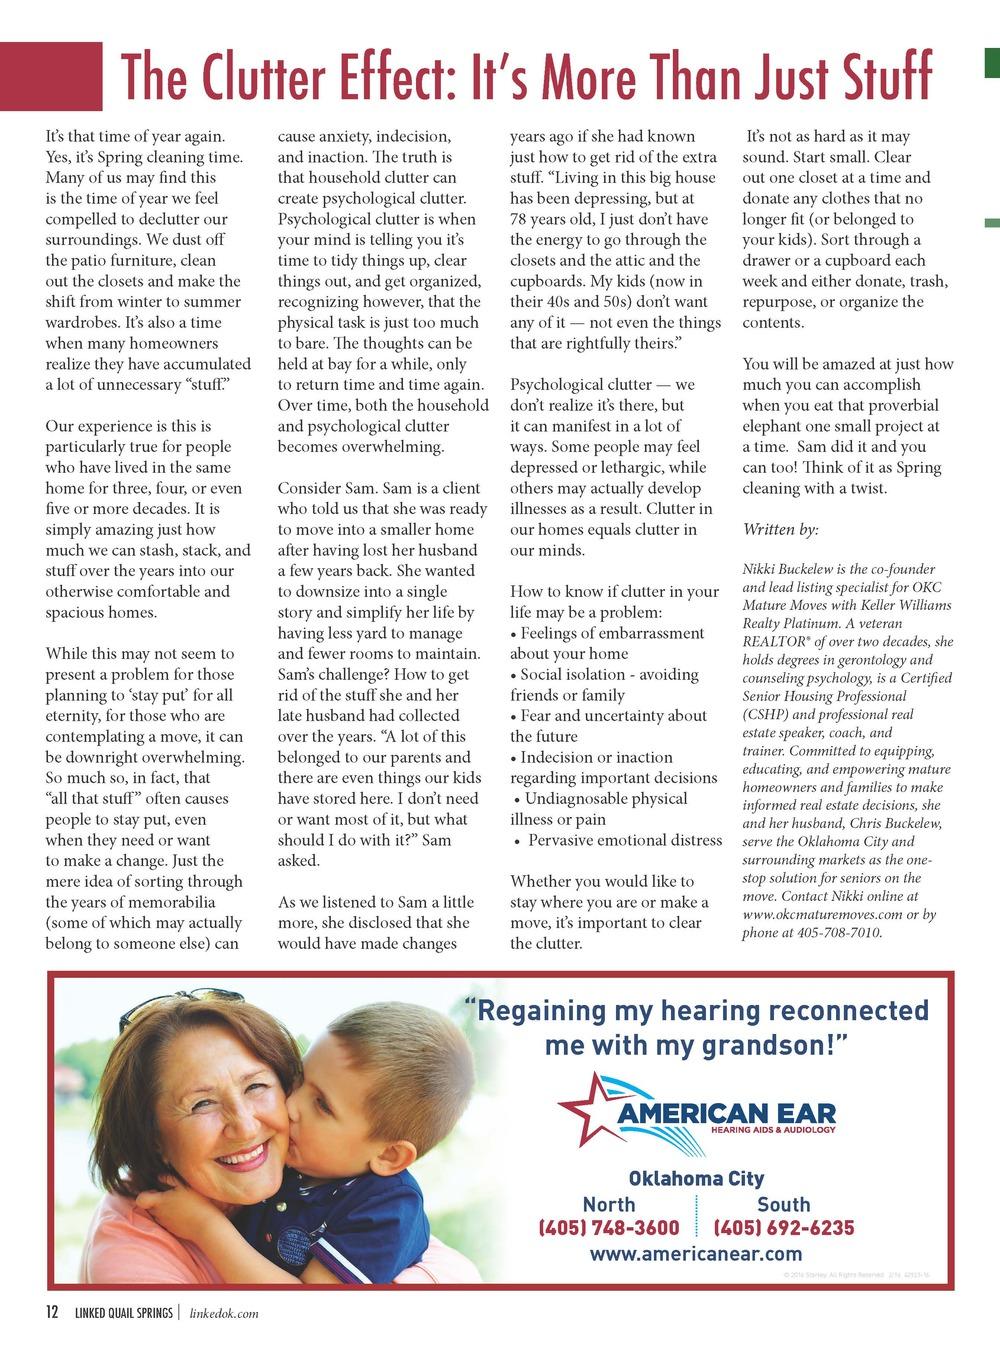 Quail Springs_May 2016_Page_12.jpg